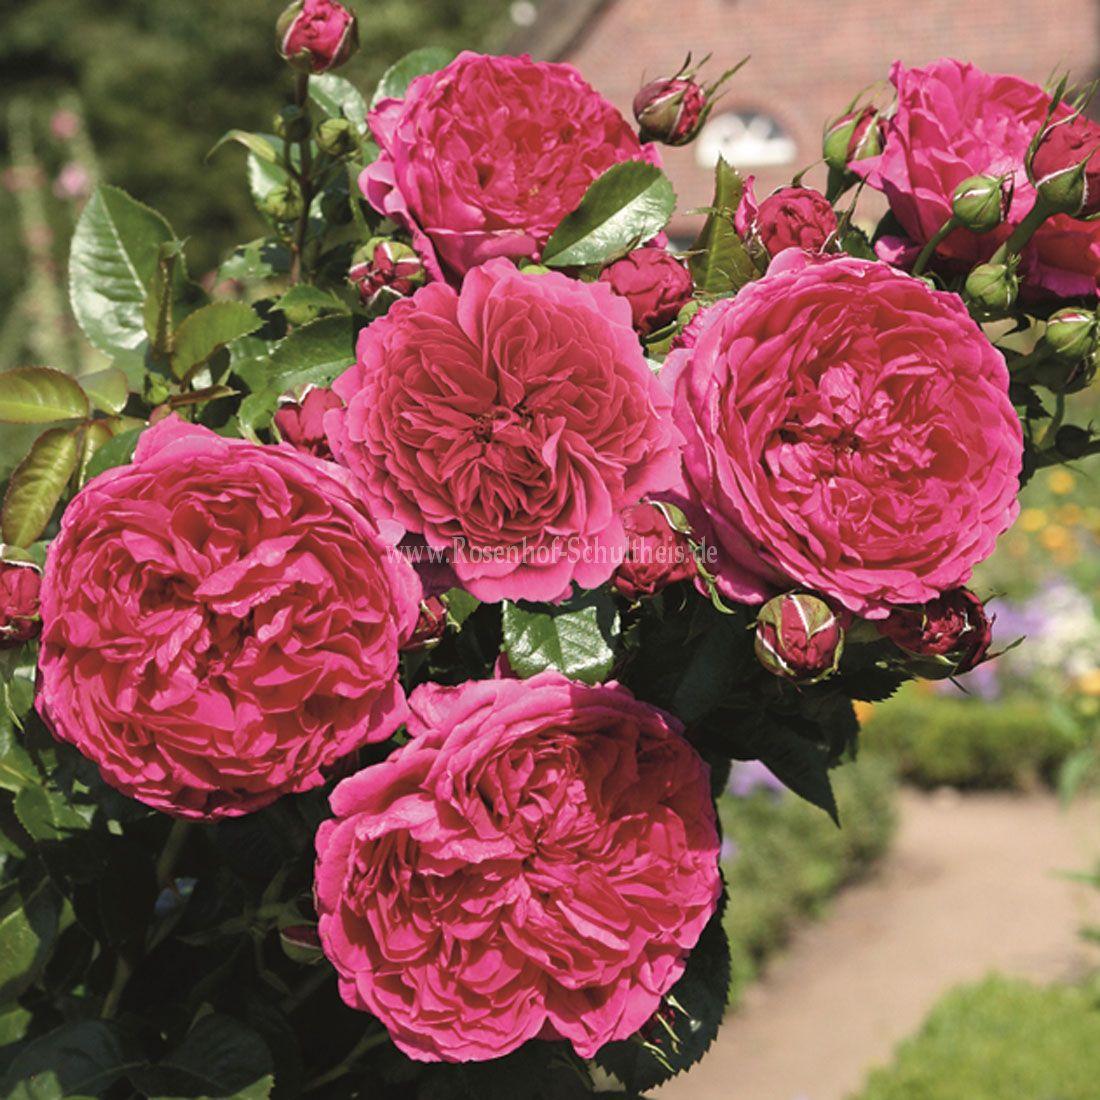 soul rosen online kaufen im rosenhof schultheis rosen online kaufen im rosenhof schultheis. Black Bedroom Furniture Sets. Home Design Ideas